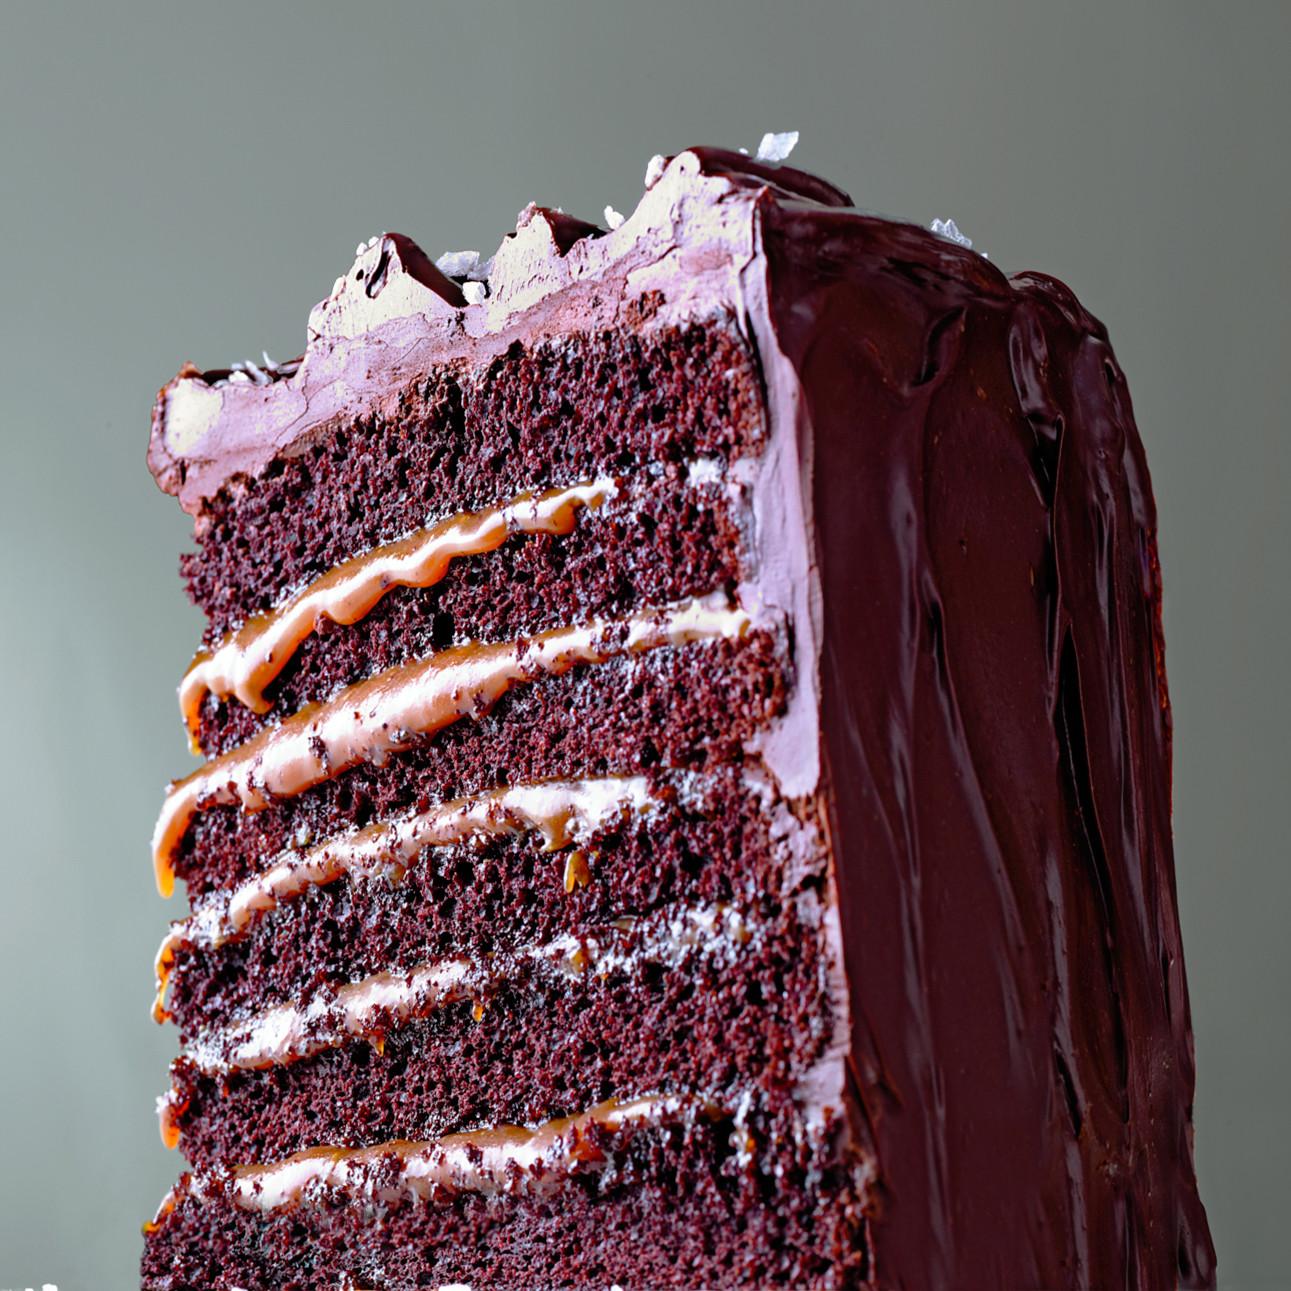 Best Six Layer Chocolate Cake